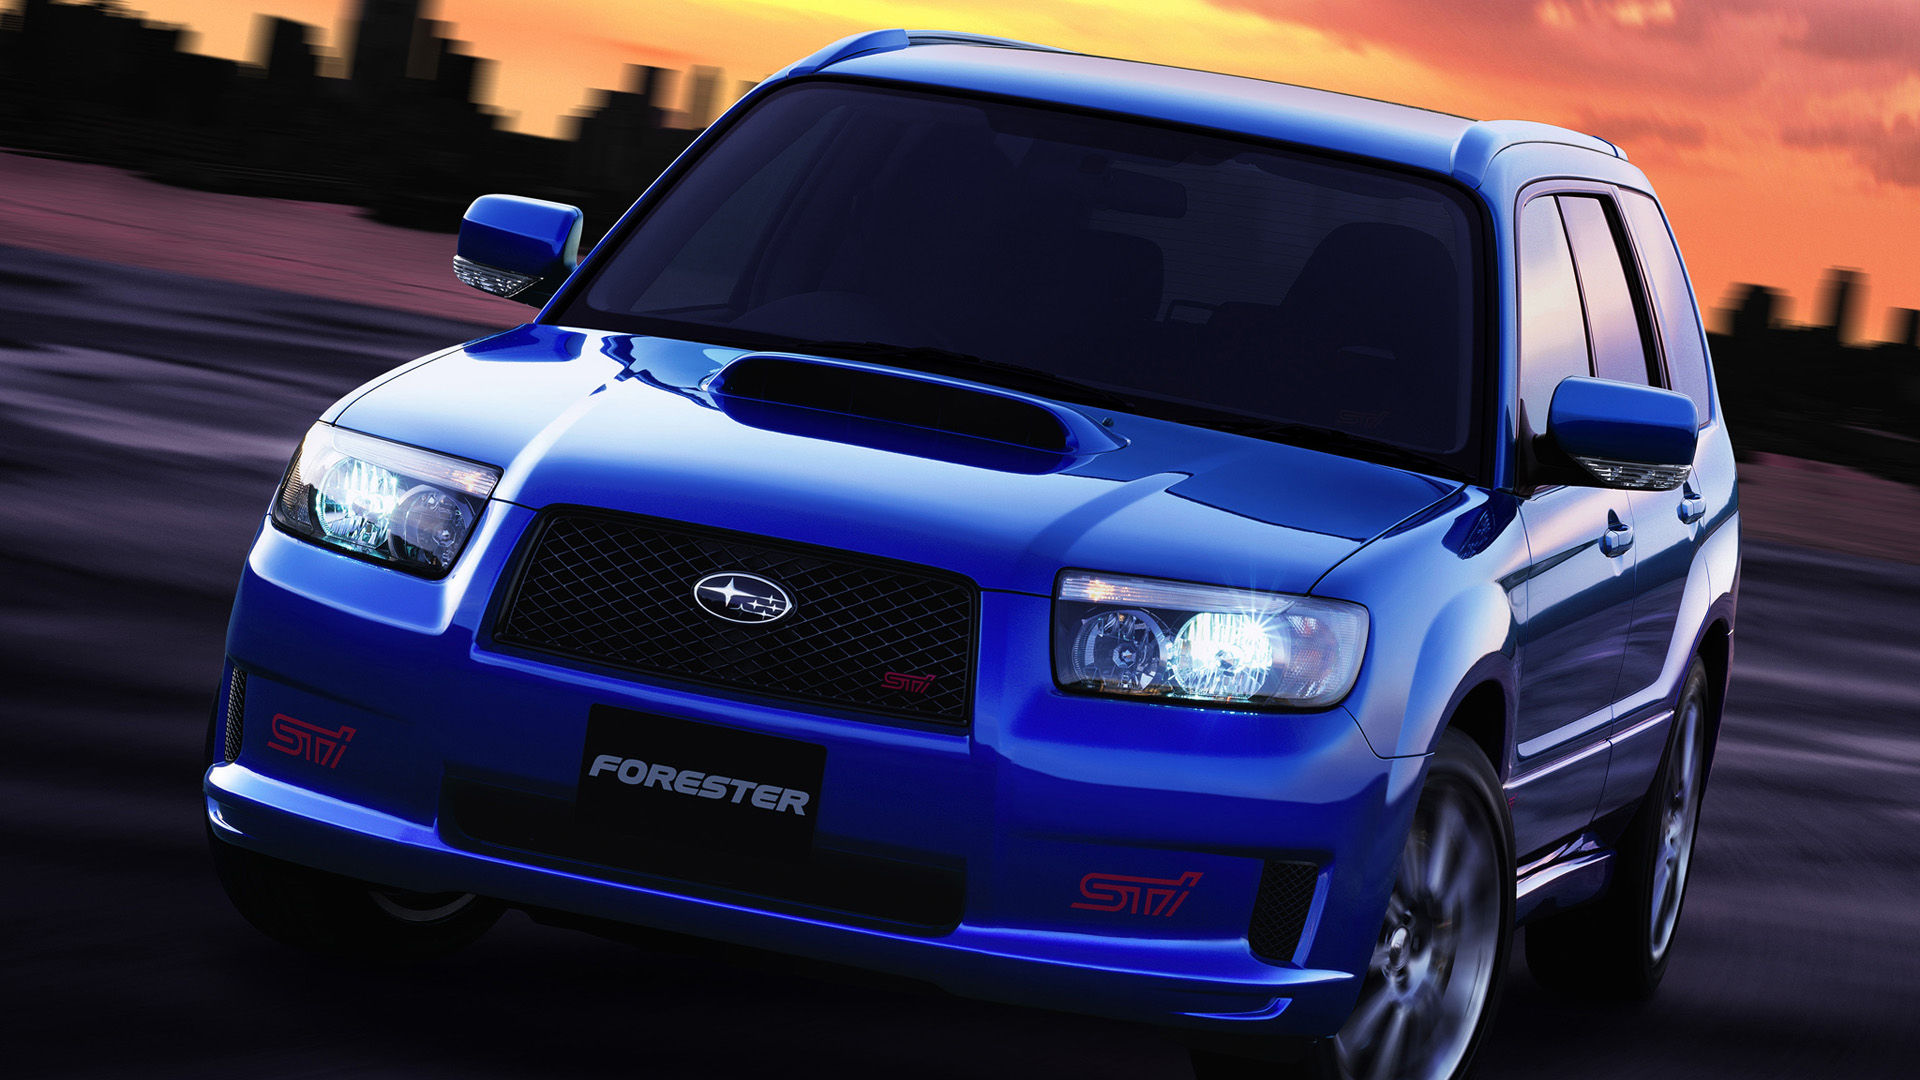 2005 Subaru Forester STI